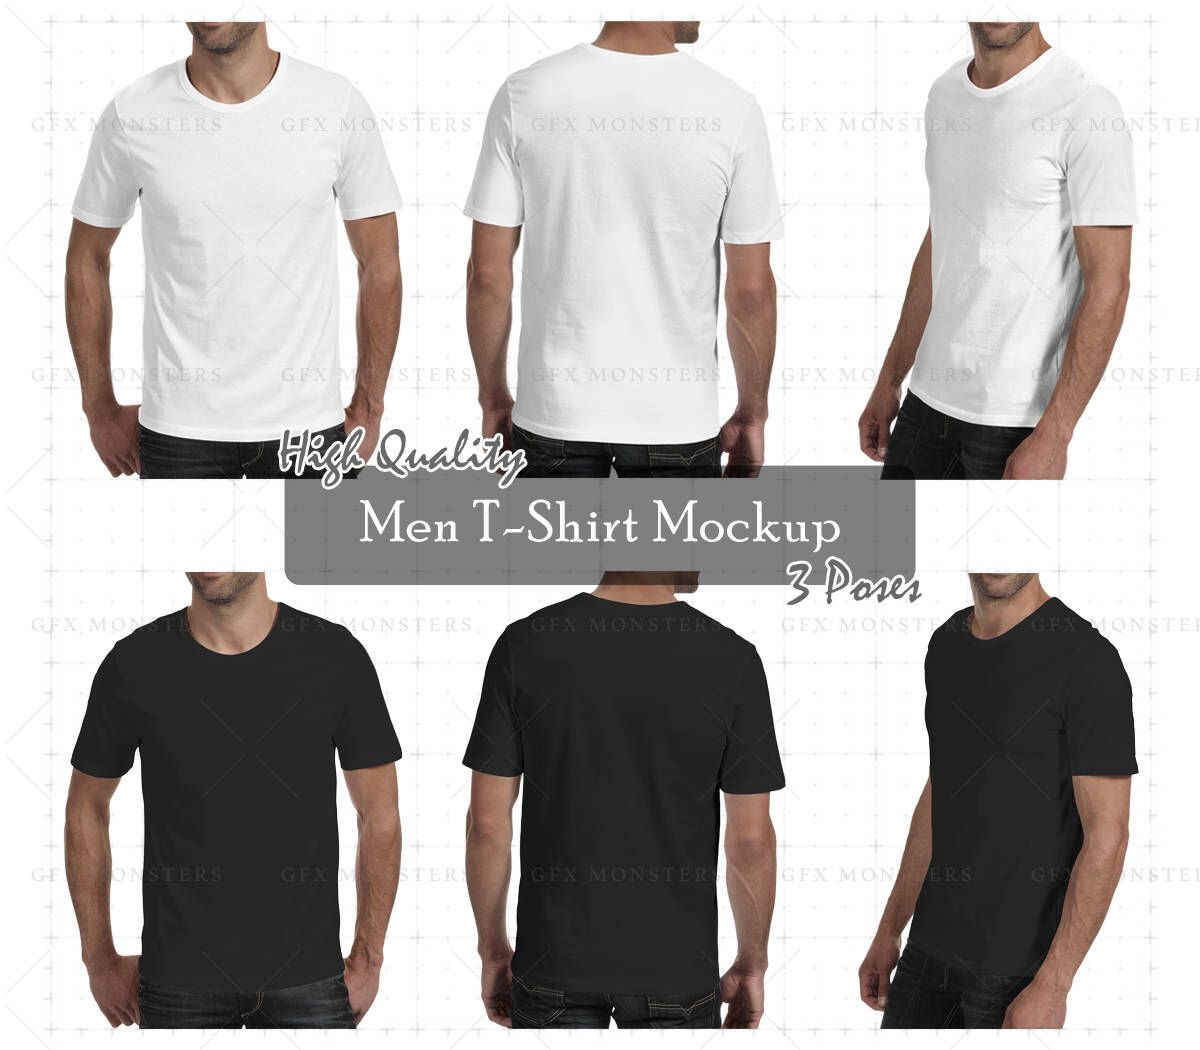 Men T Shirt Mockup Psd Front Back Perspective Png Psd Apparel Mock Up High Resolution Mock Up Instant Download In 2021 Clothing Mockup Tshirt Mockup Mens Tshirts